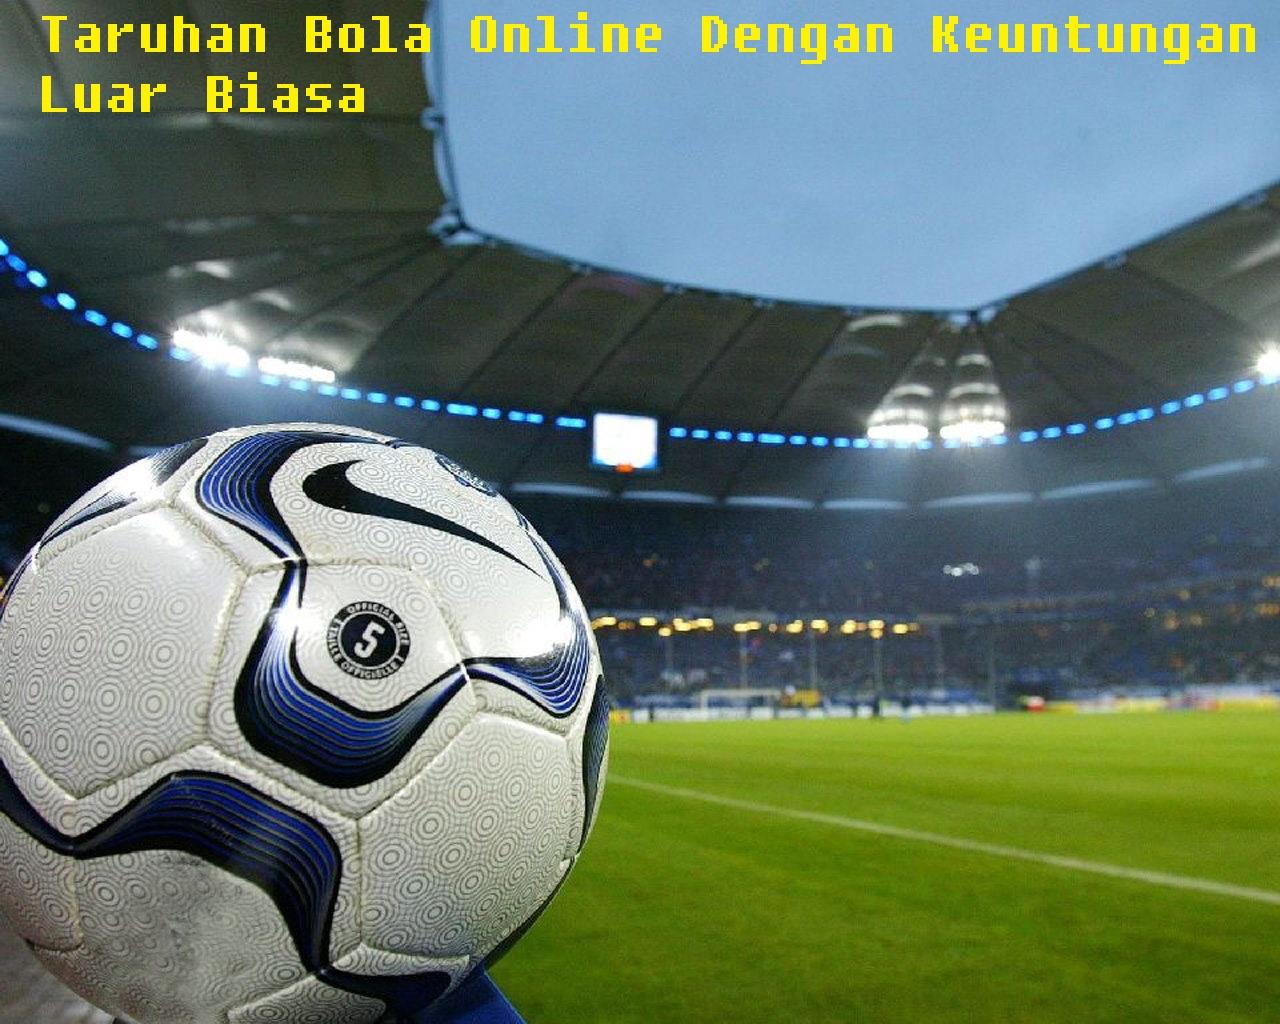 Taruhan Bola Online Dengan Keuntungan Luar Biasa